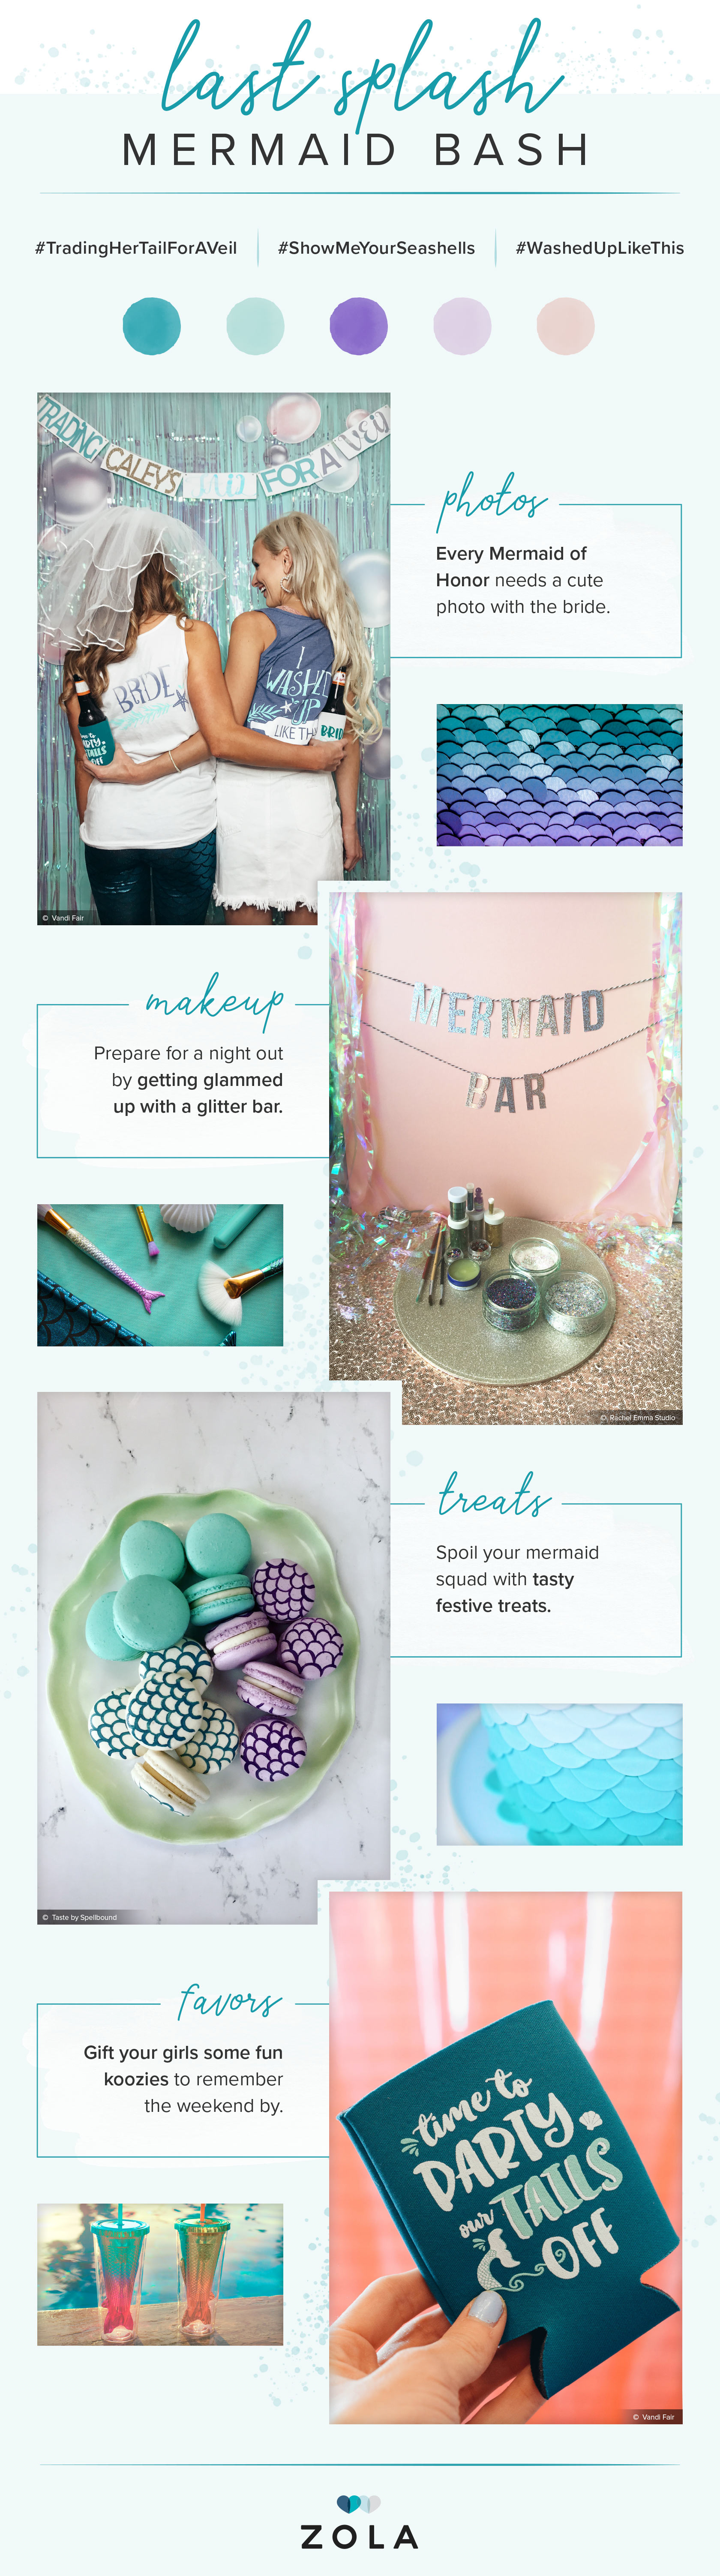 mermaid bachelorette party ideas.jpg